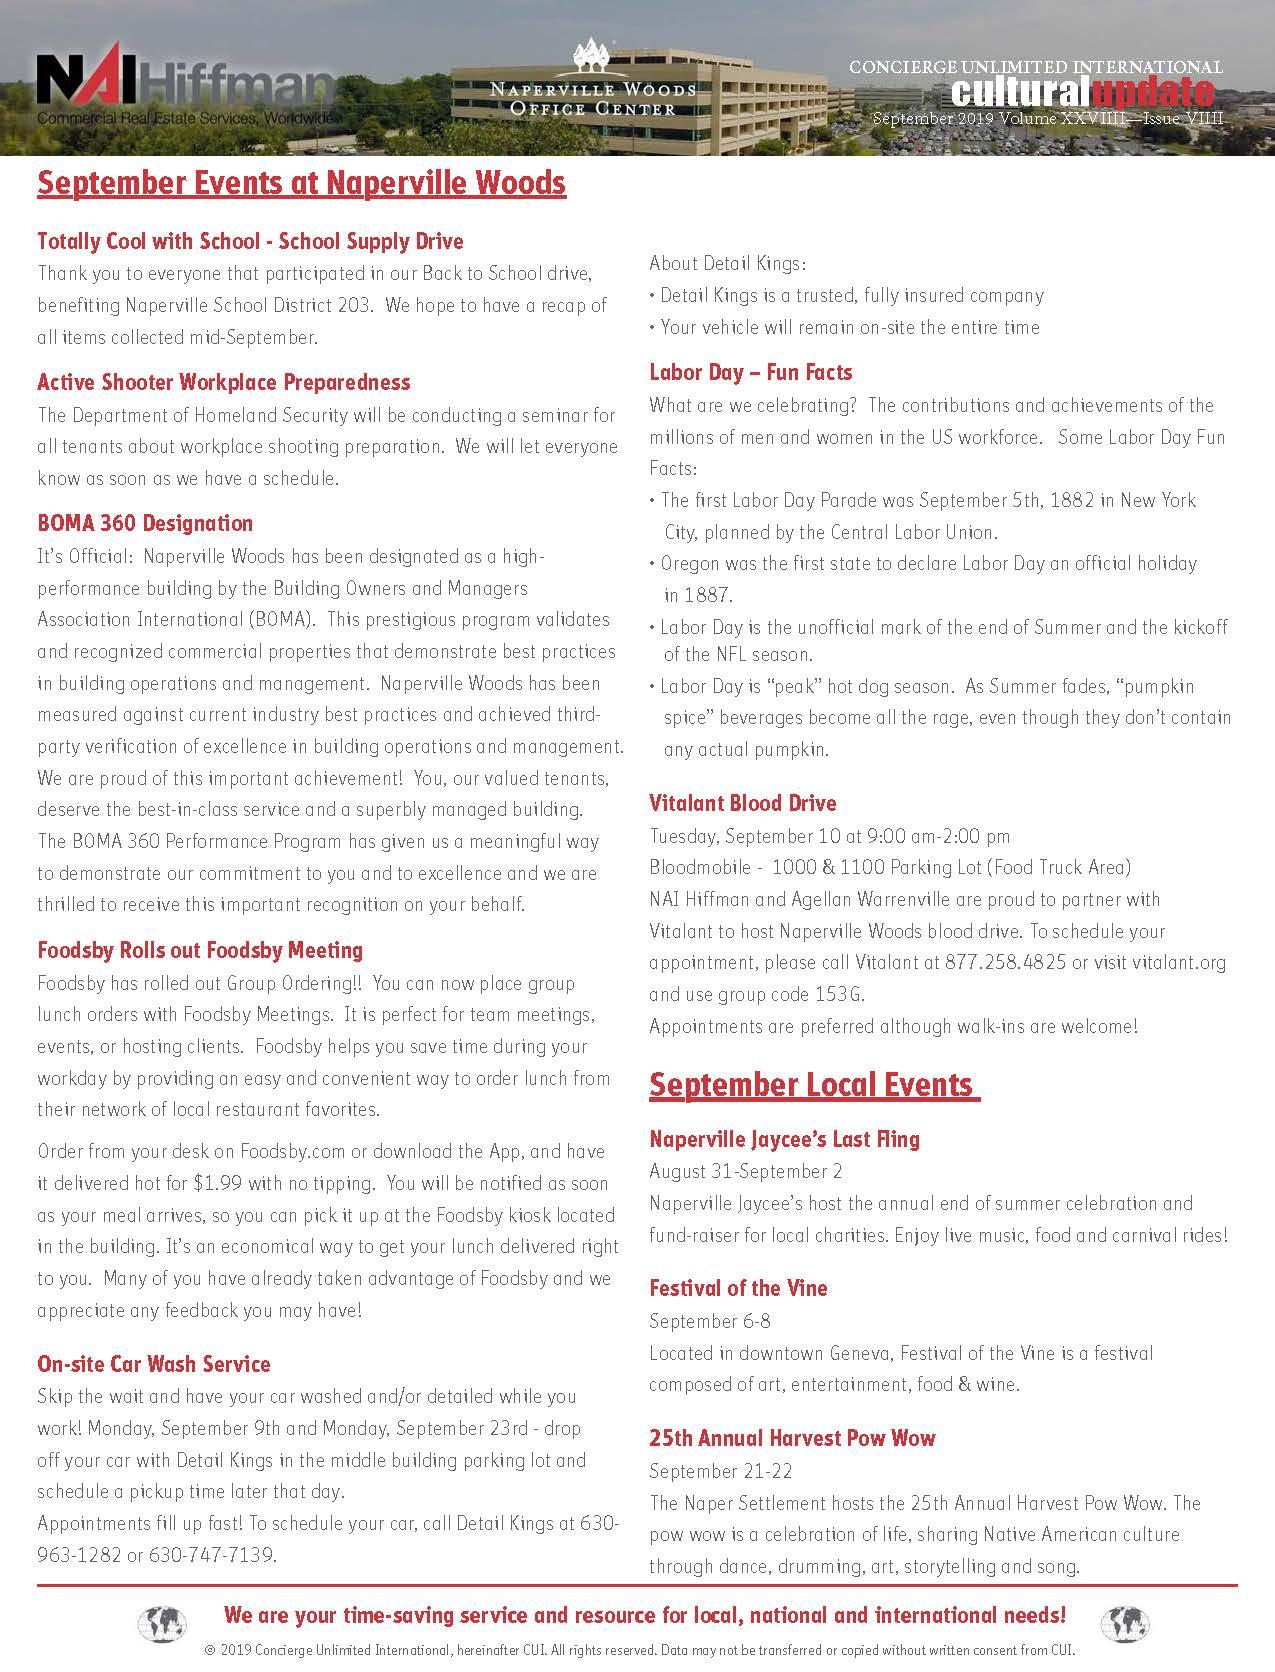 September Cultural Update_Page_1.jpg